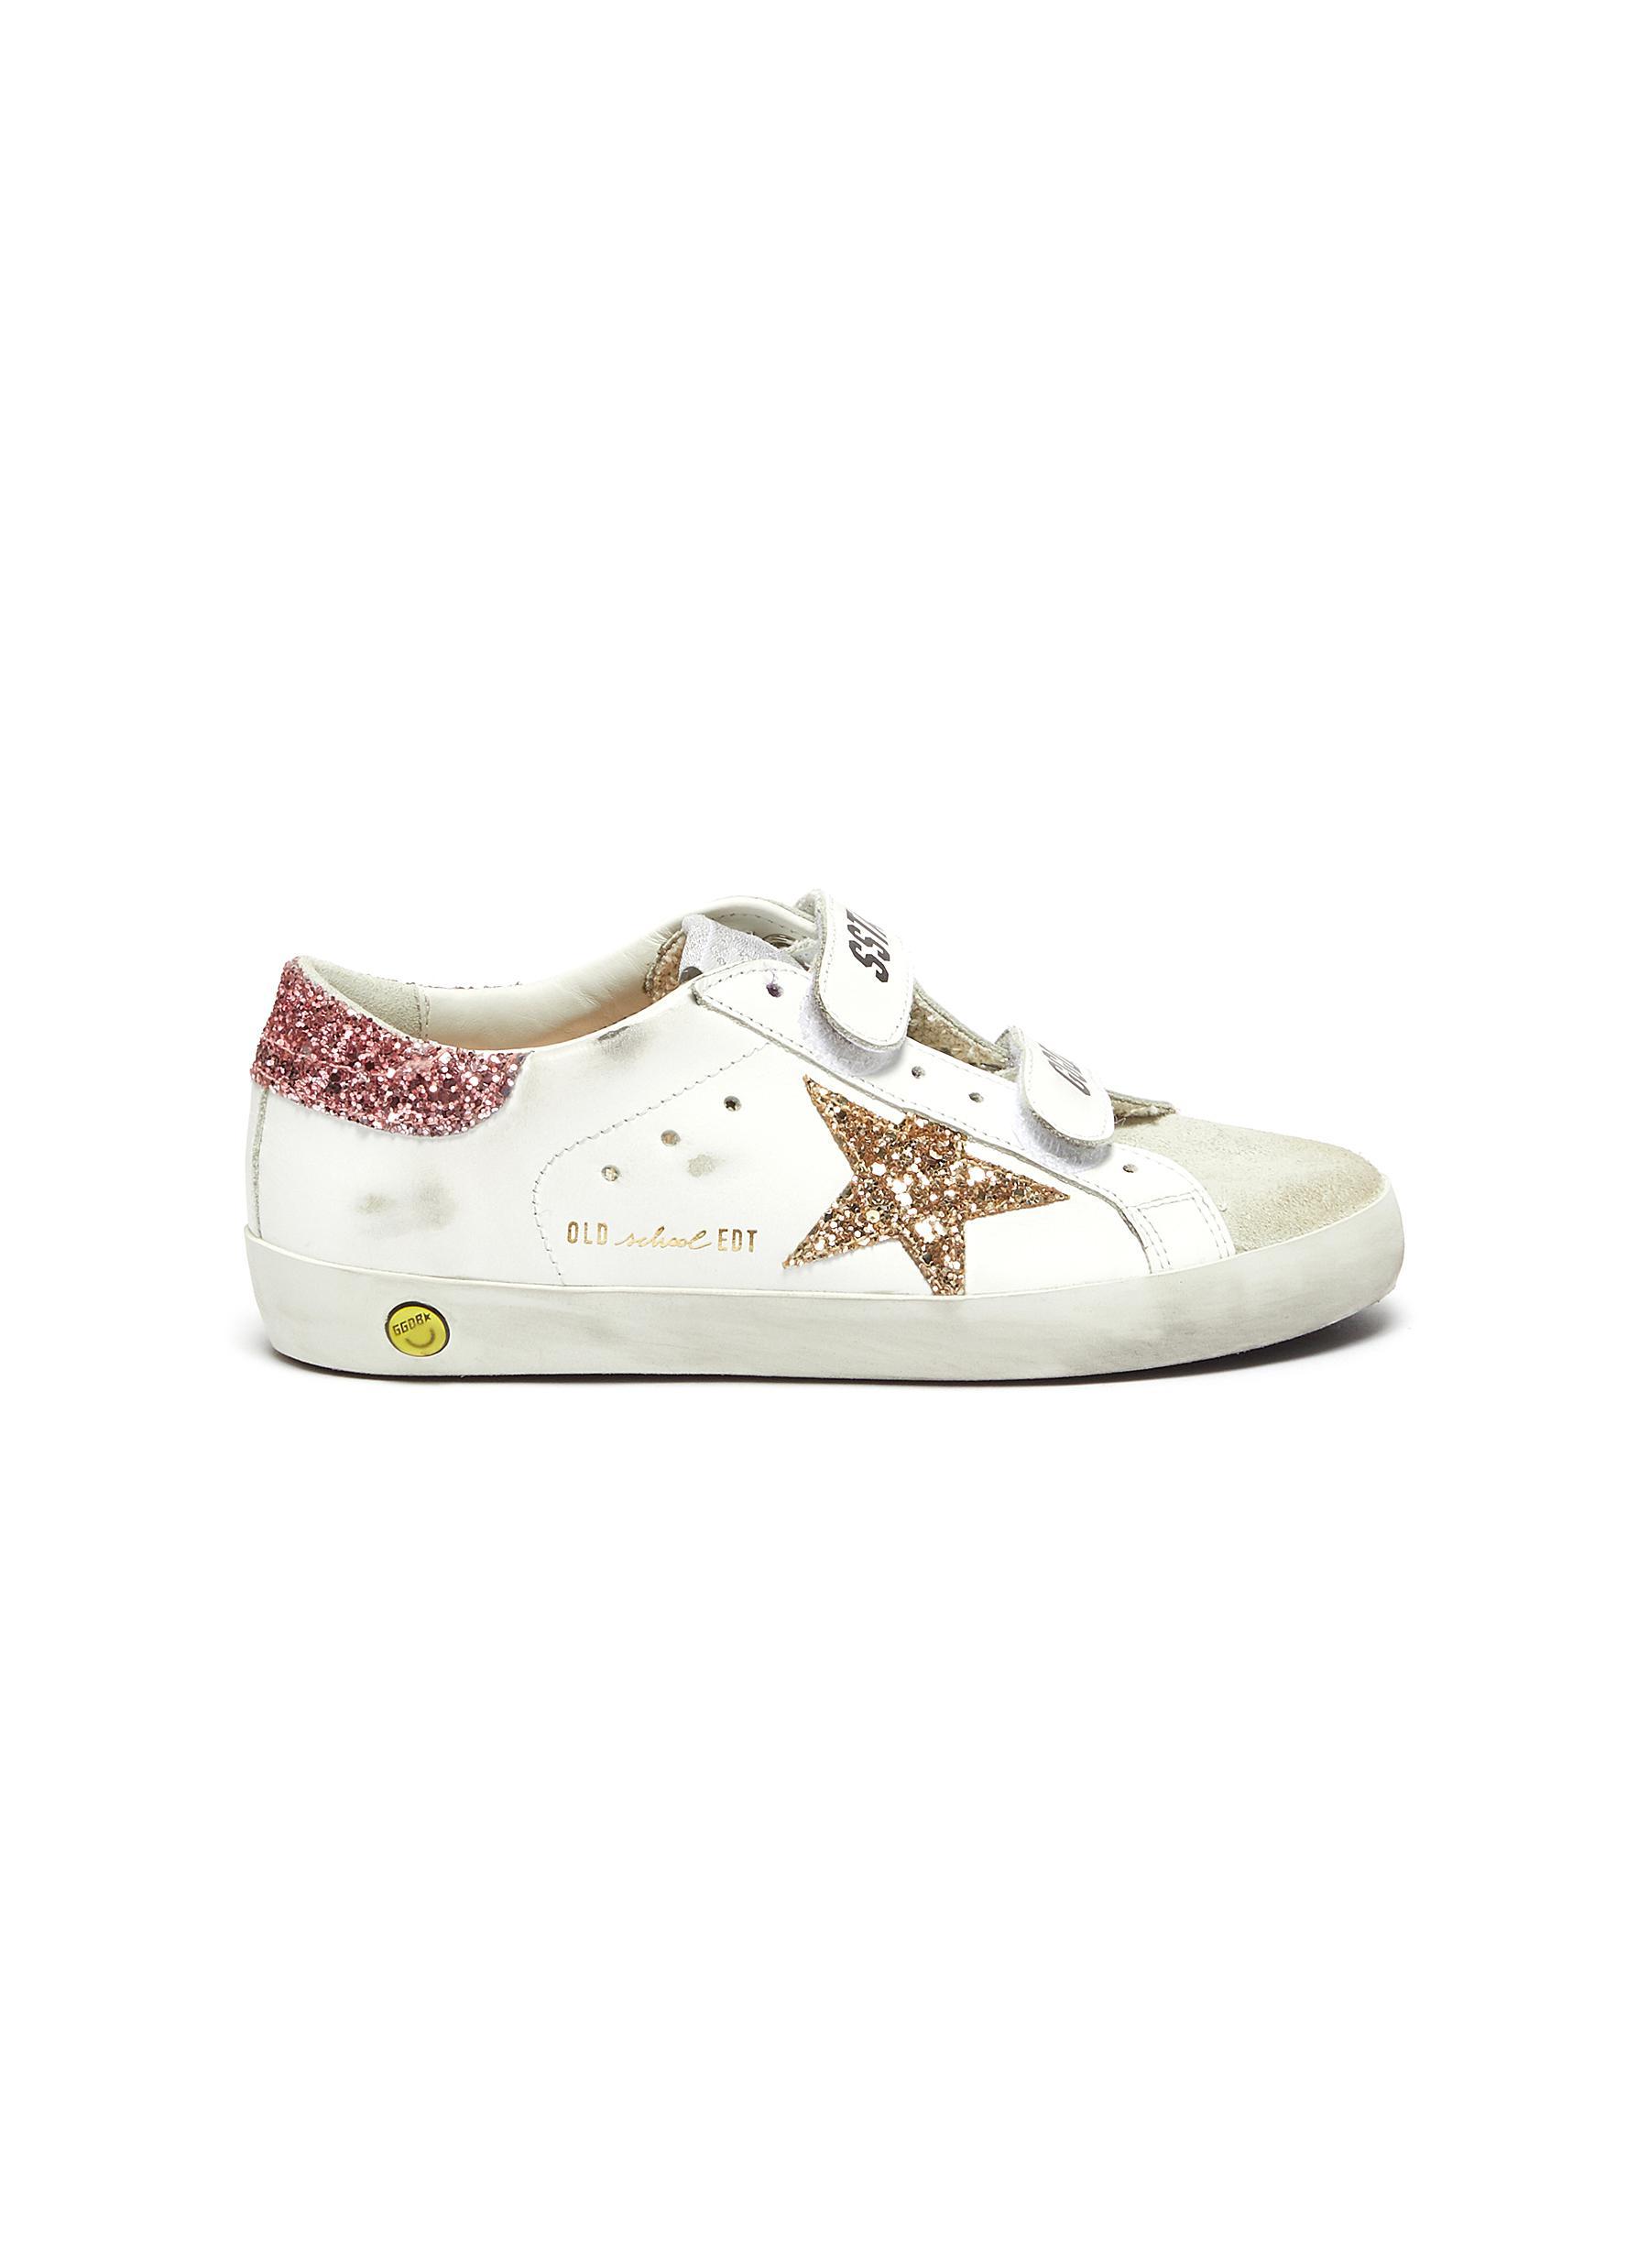 'Old School' Glitter Star Motif Distressed Kids Leather Sneakers